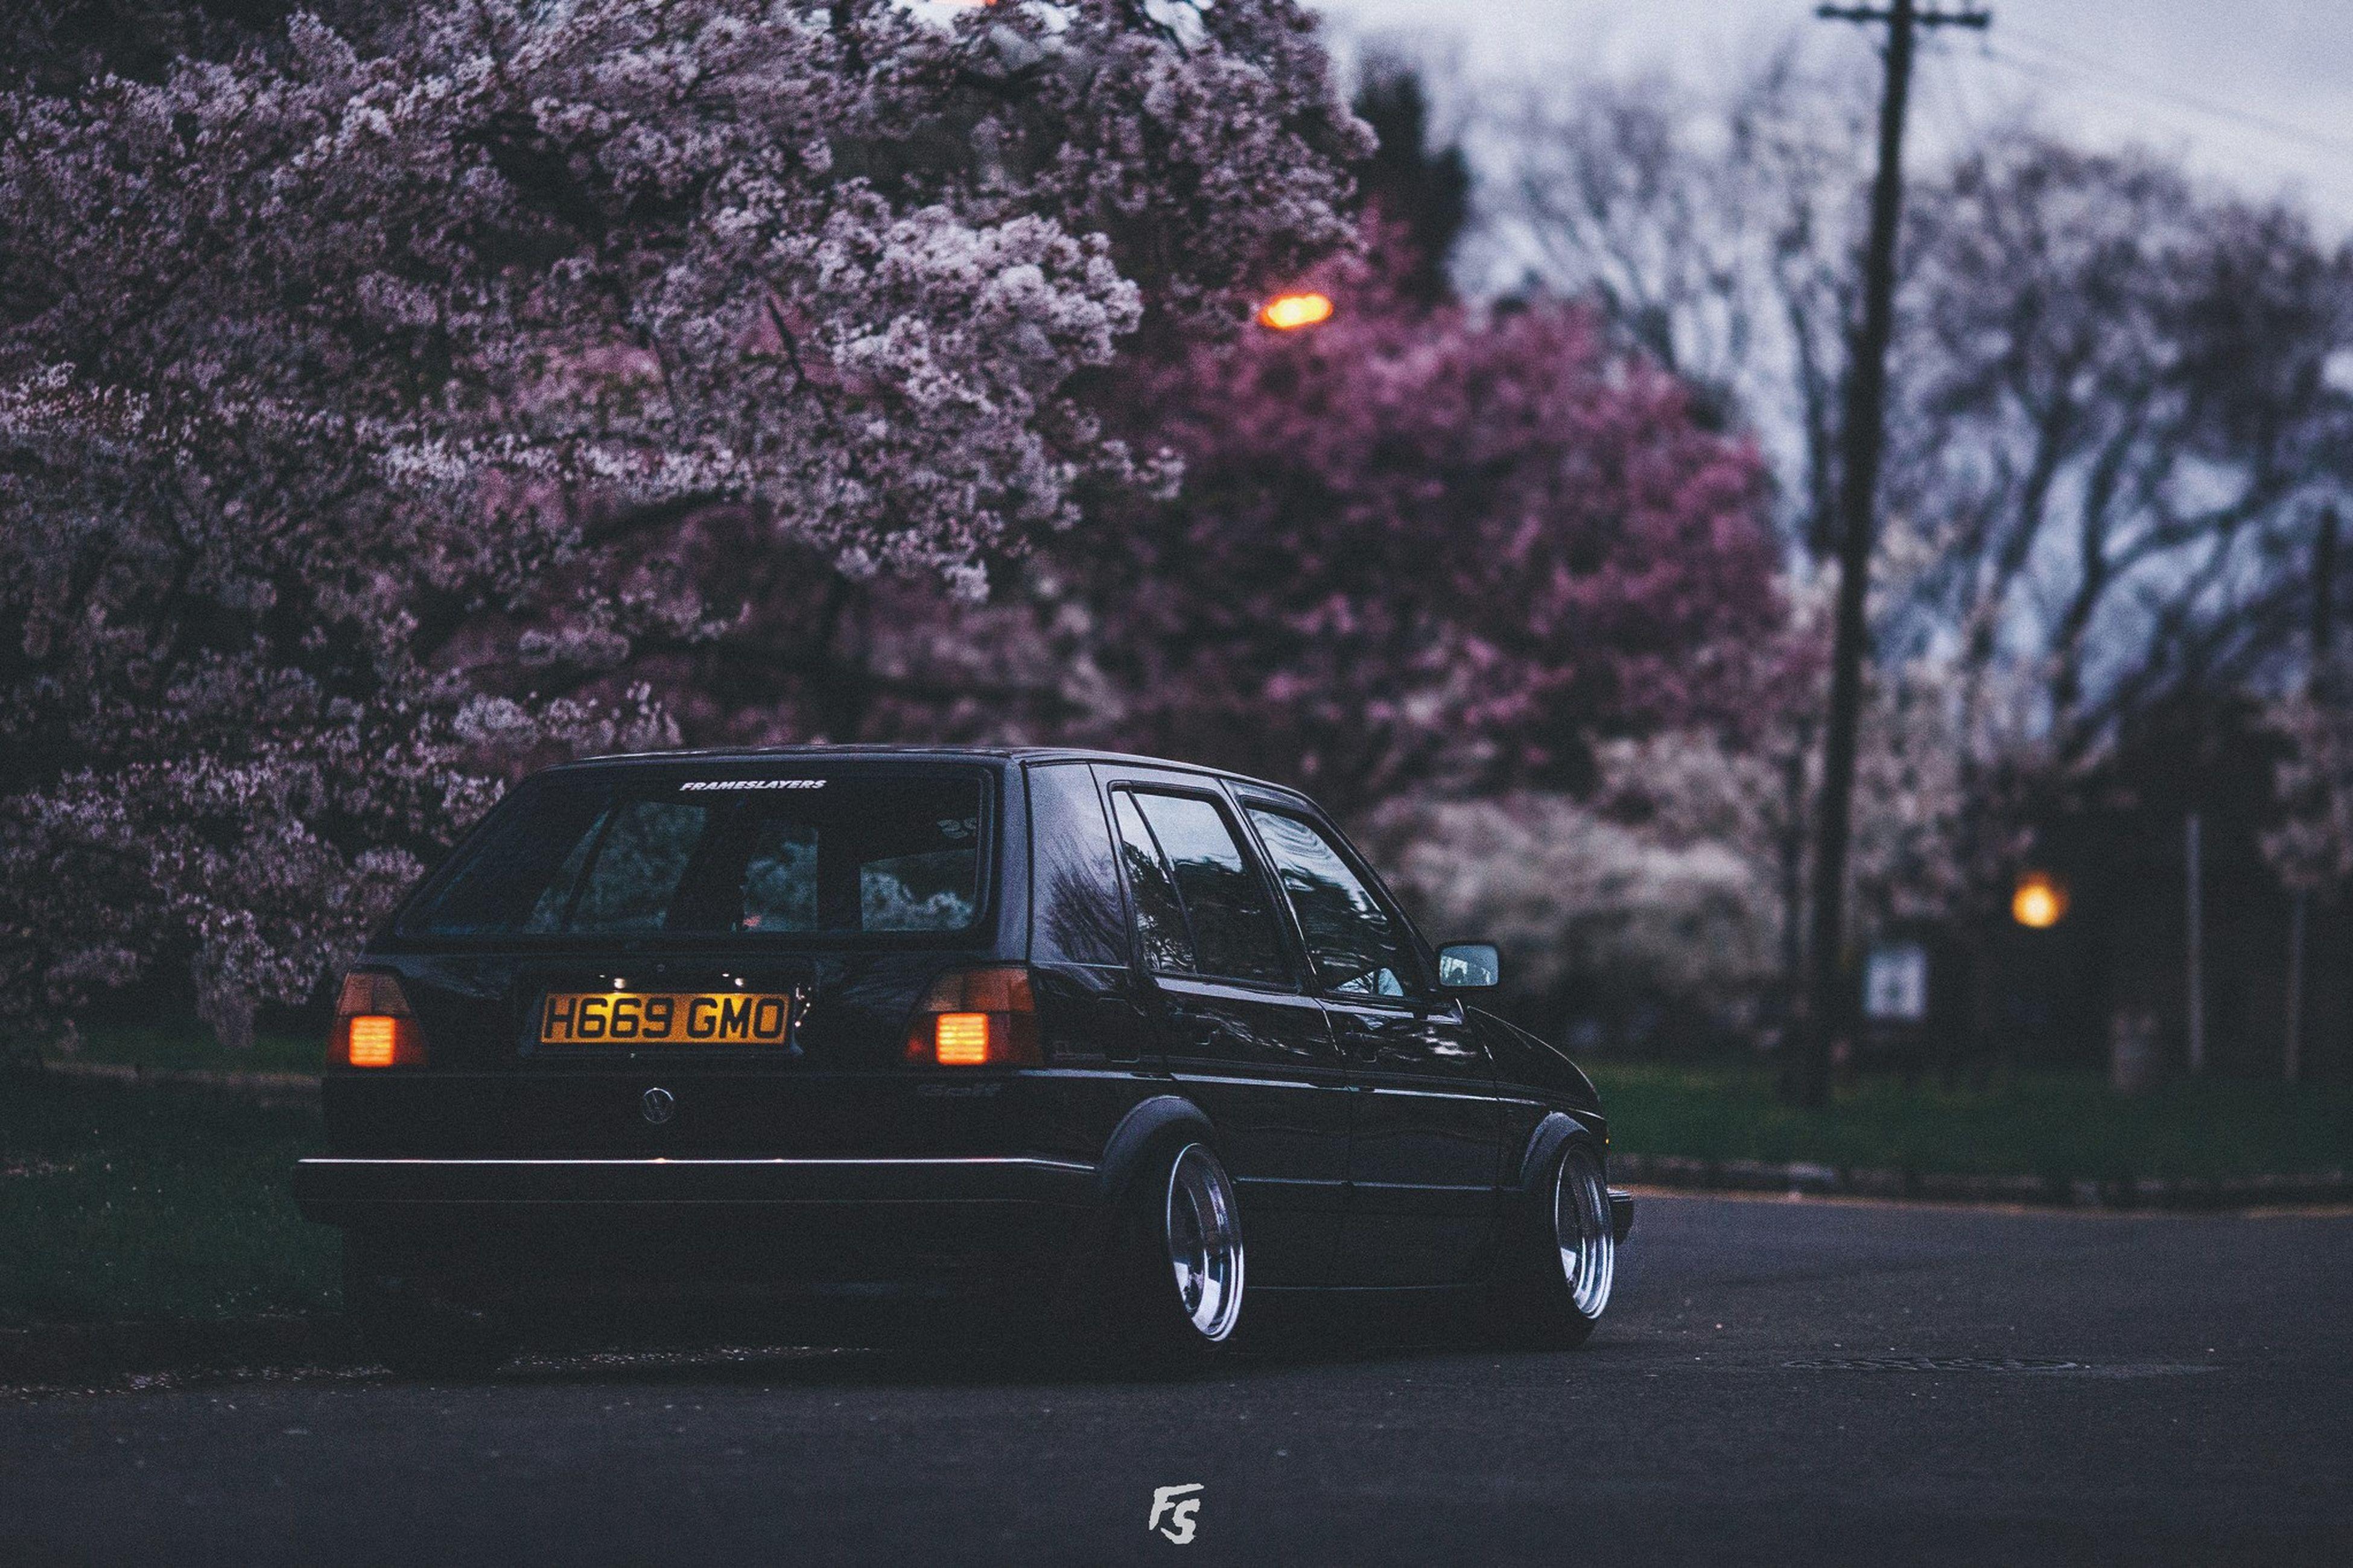 car, tree, transportation, land vehicle, outdoors, flower, no people, illuminated, nature, sky, day